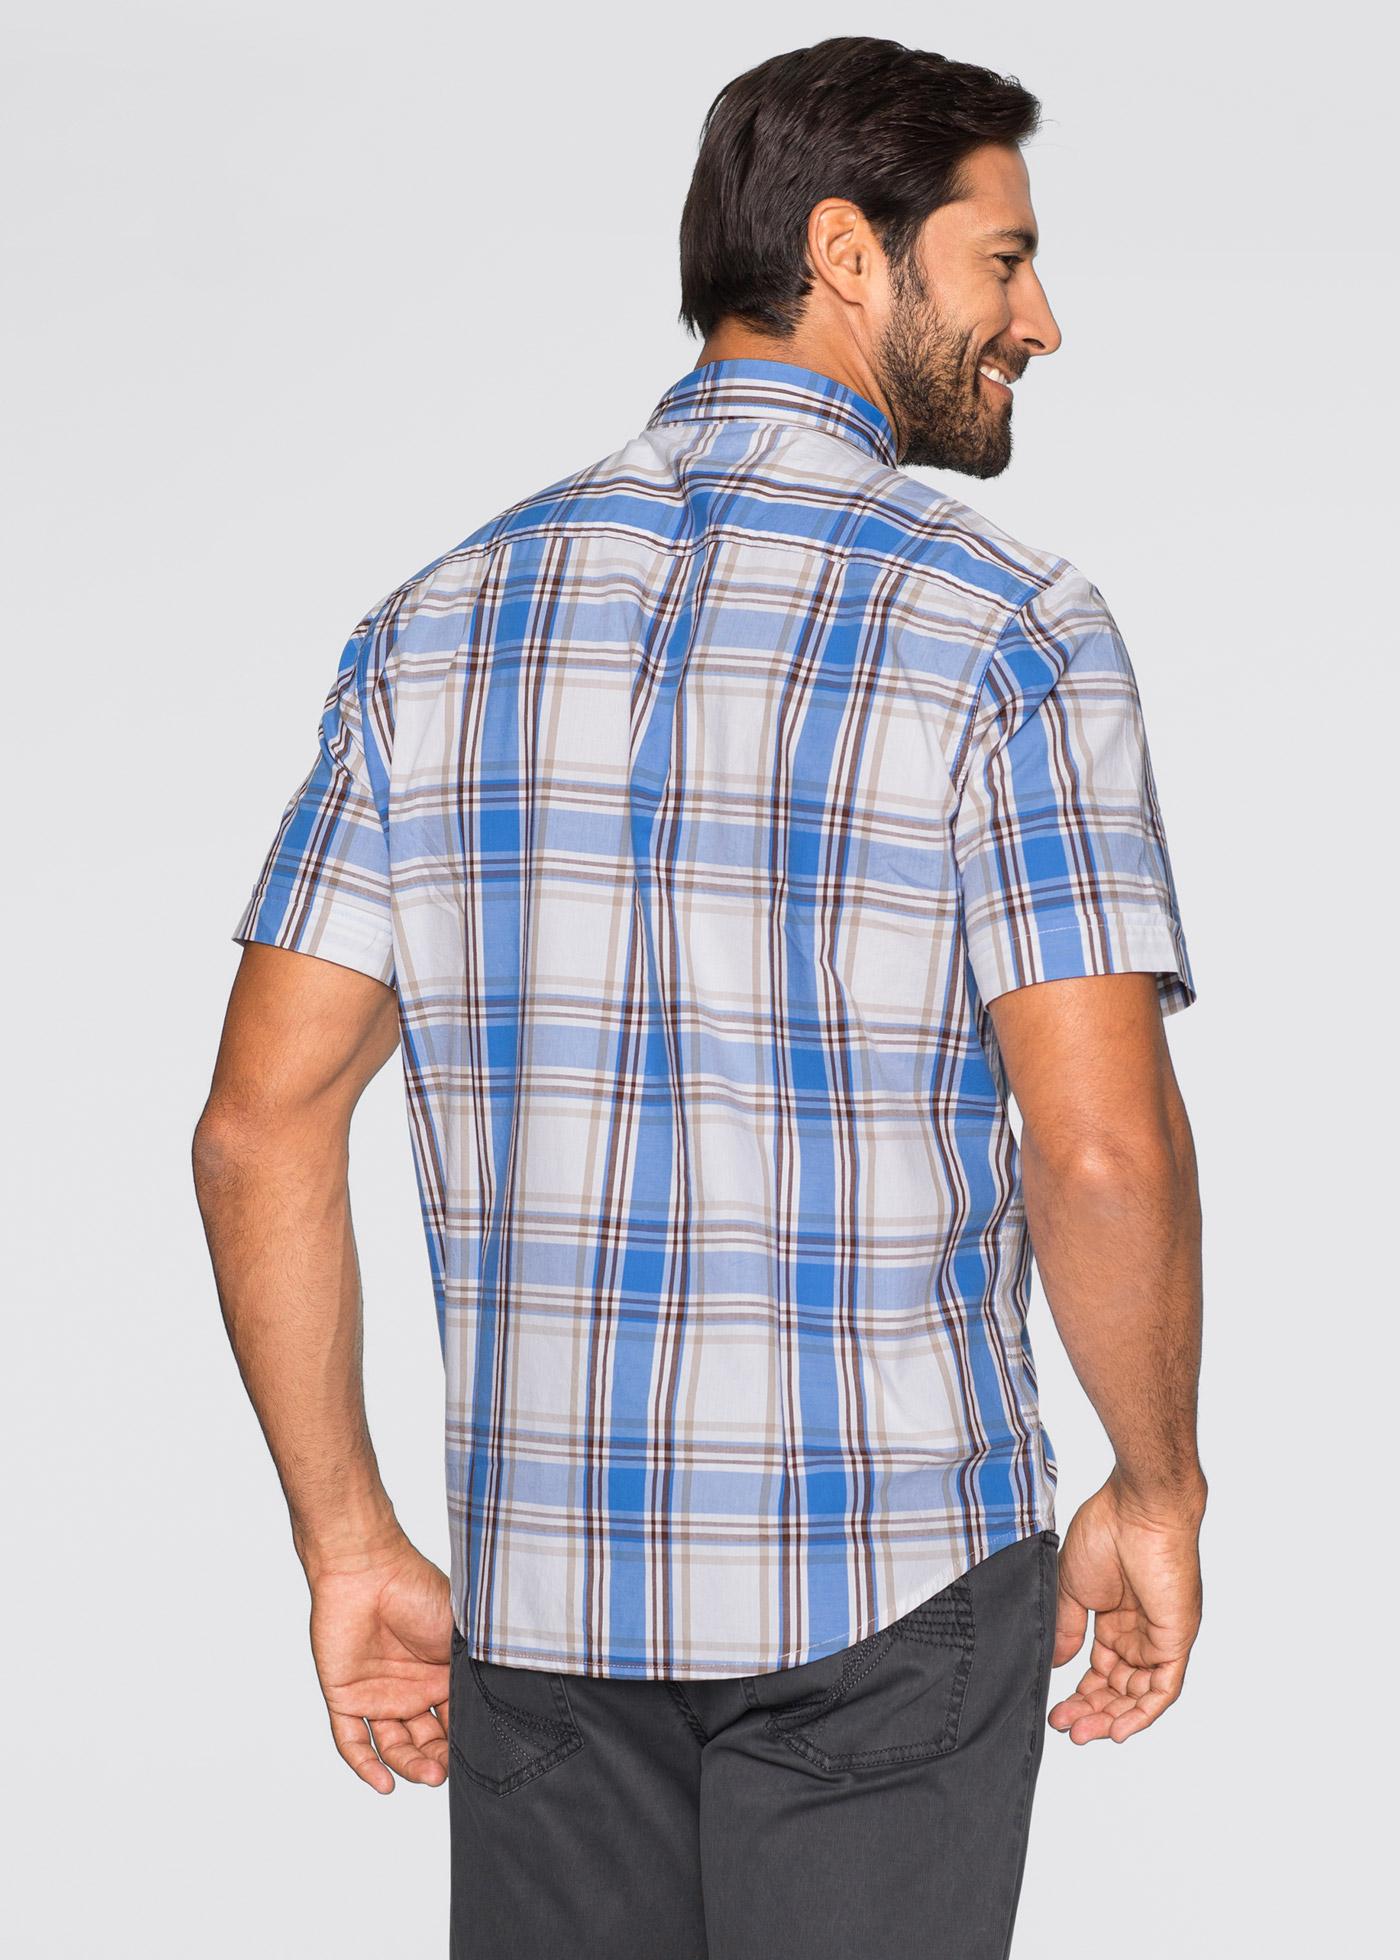 Rutig skjorta, bpc selection, mellanblå/vit, rutig